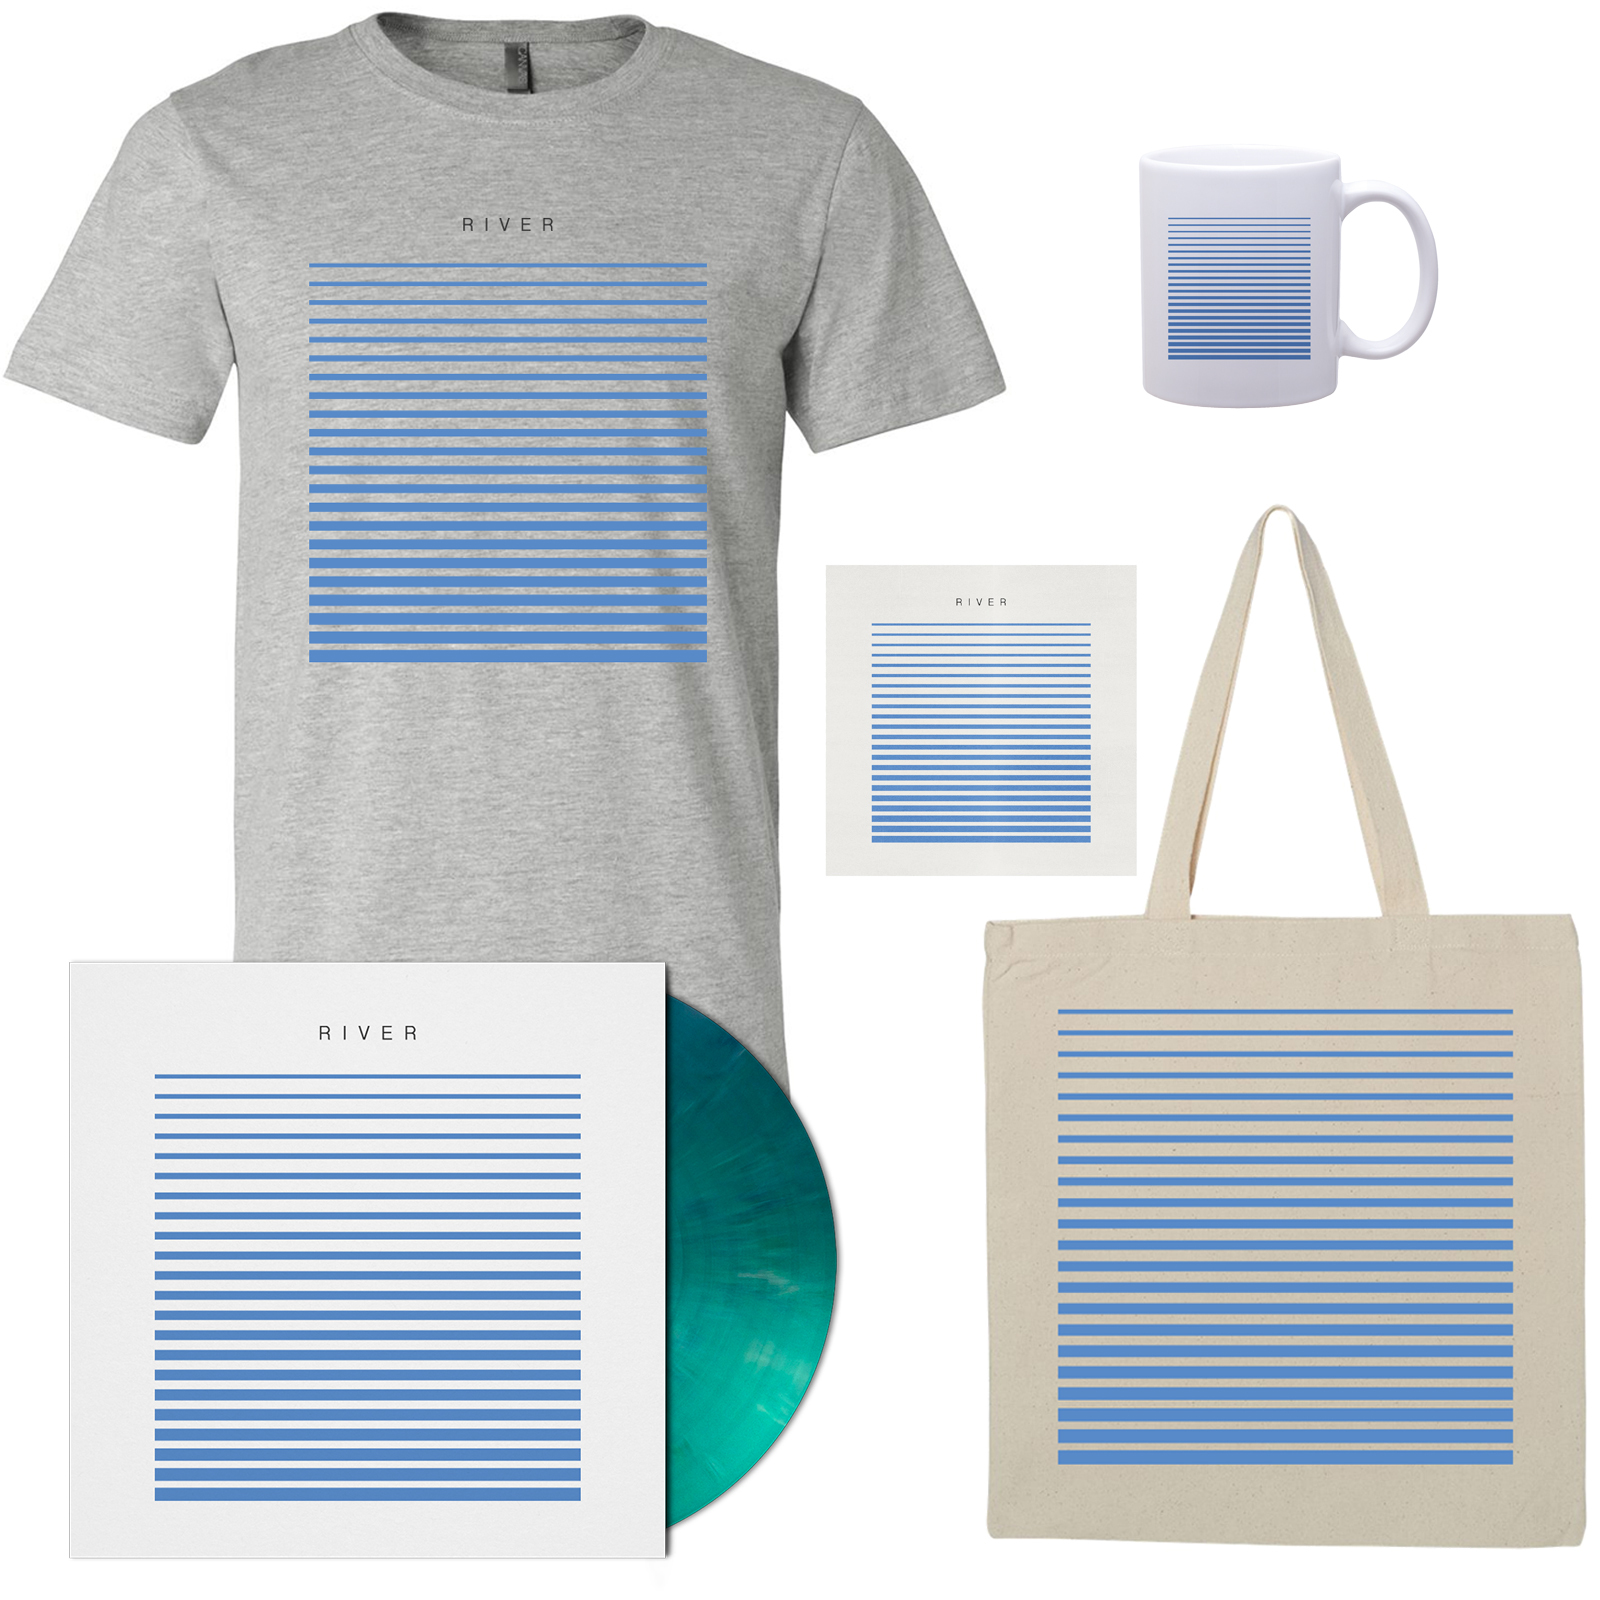 River T-Shirt - Grey, Tote, Mug, Vinyl, and CD Bundle